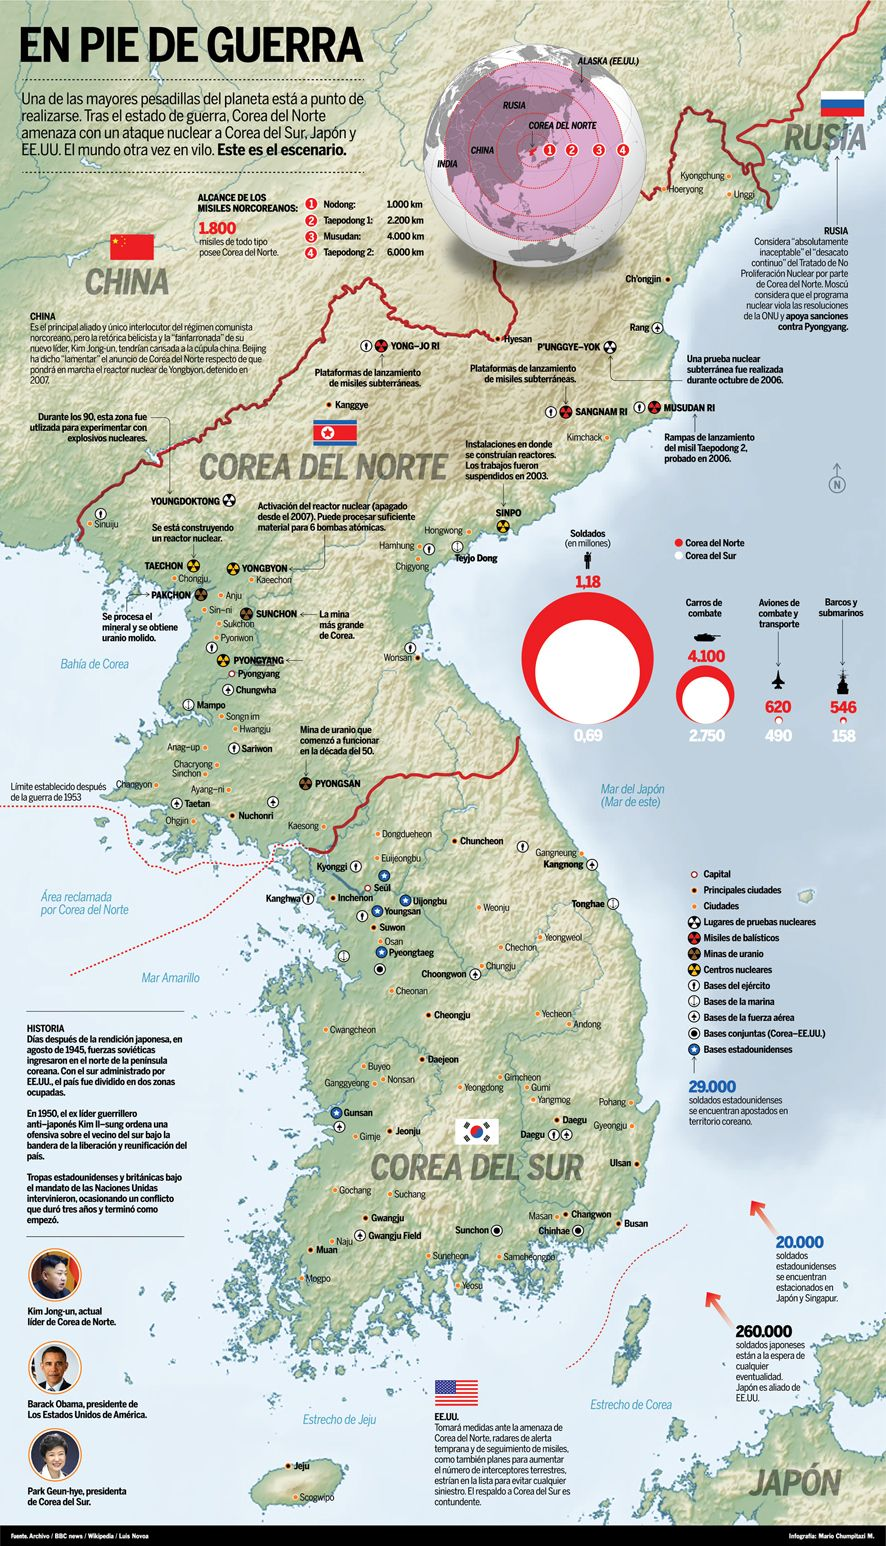 Guerra De Corea Mapa.Pin En Historia